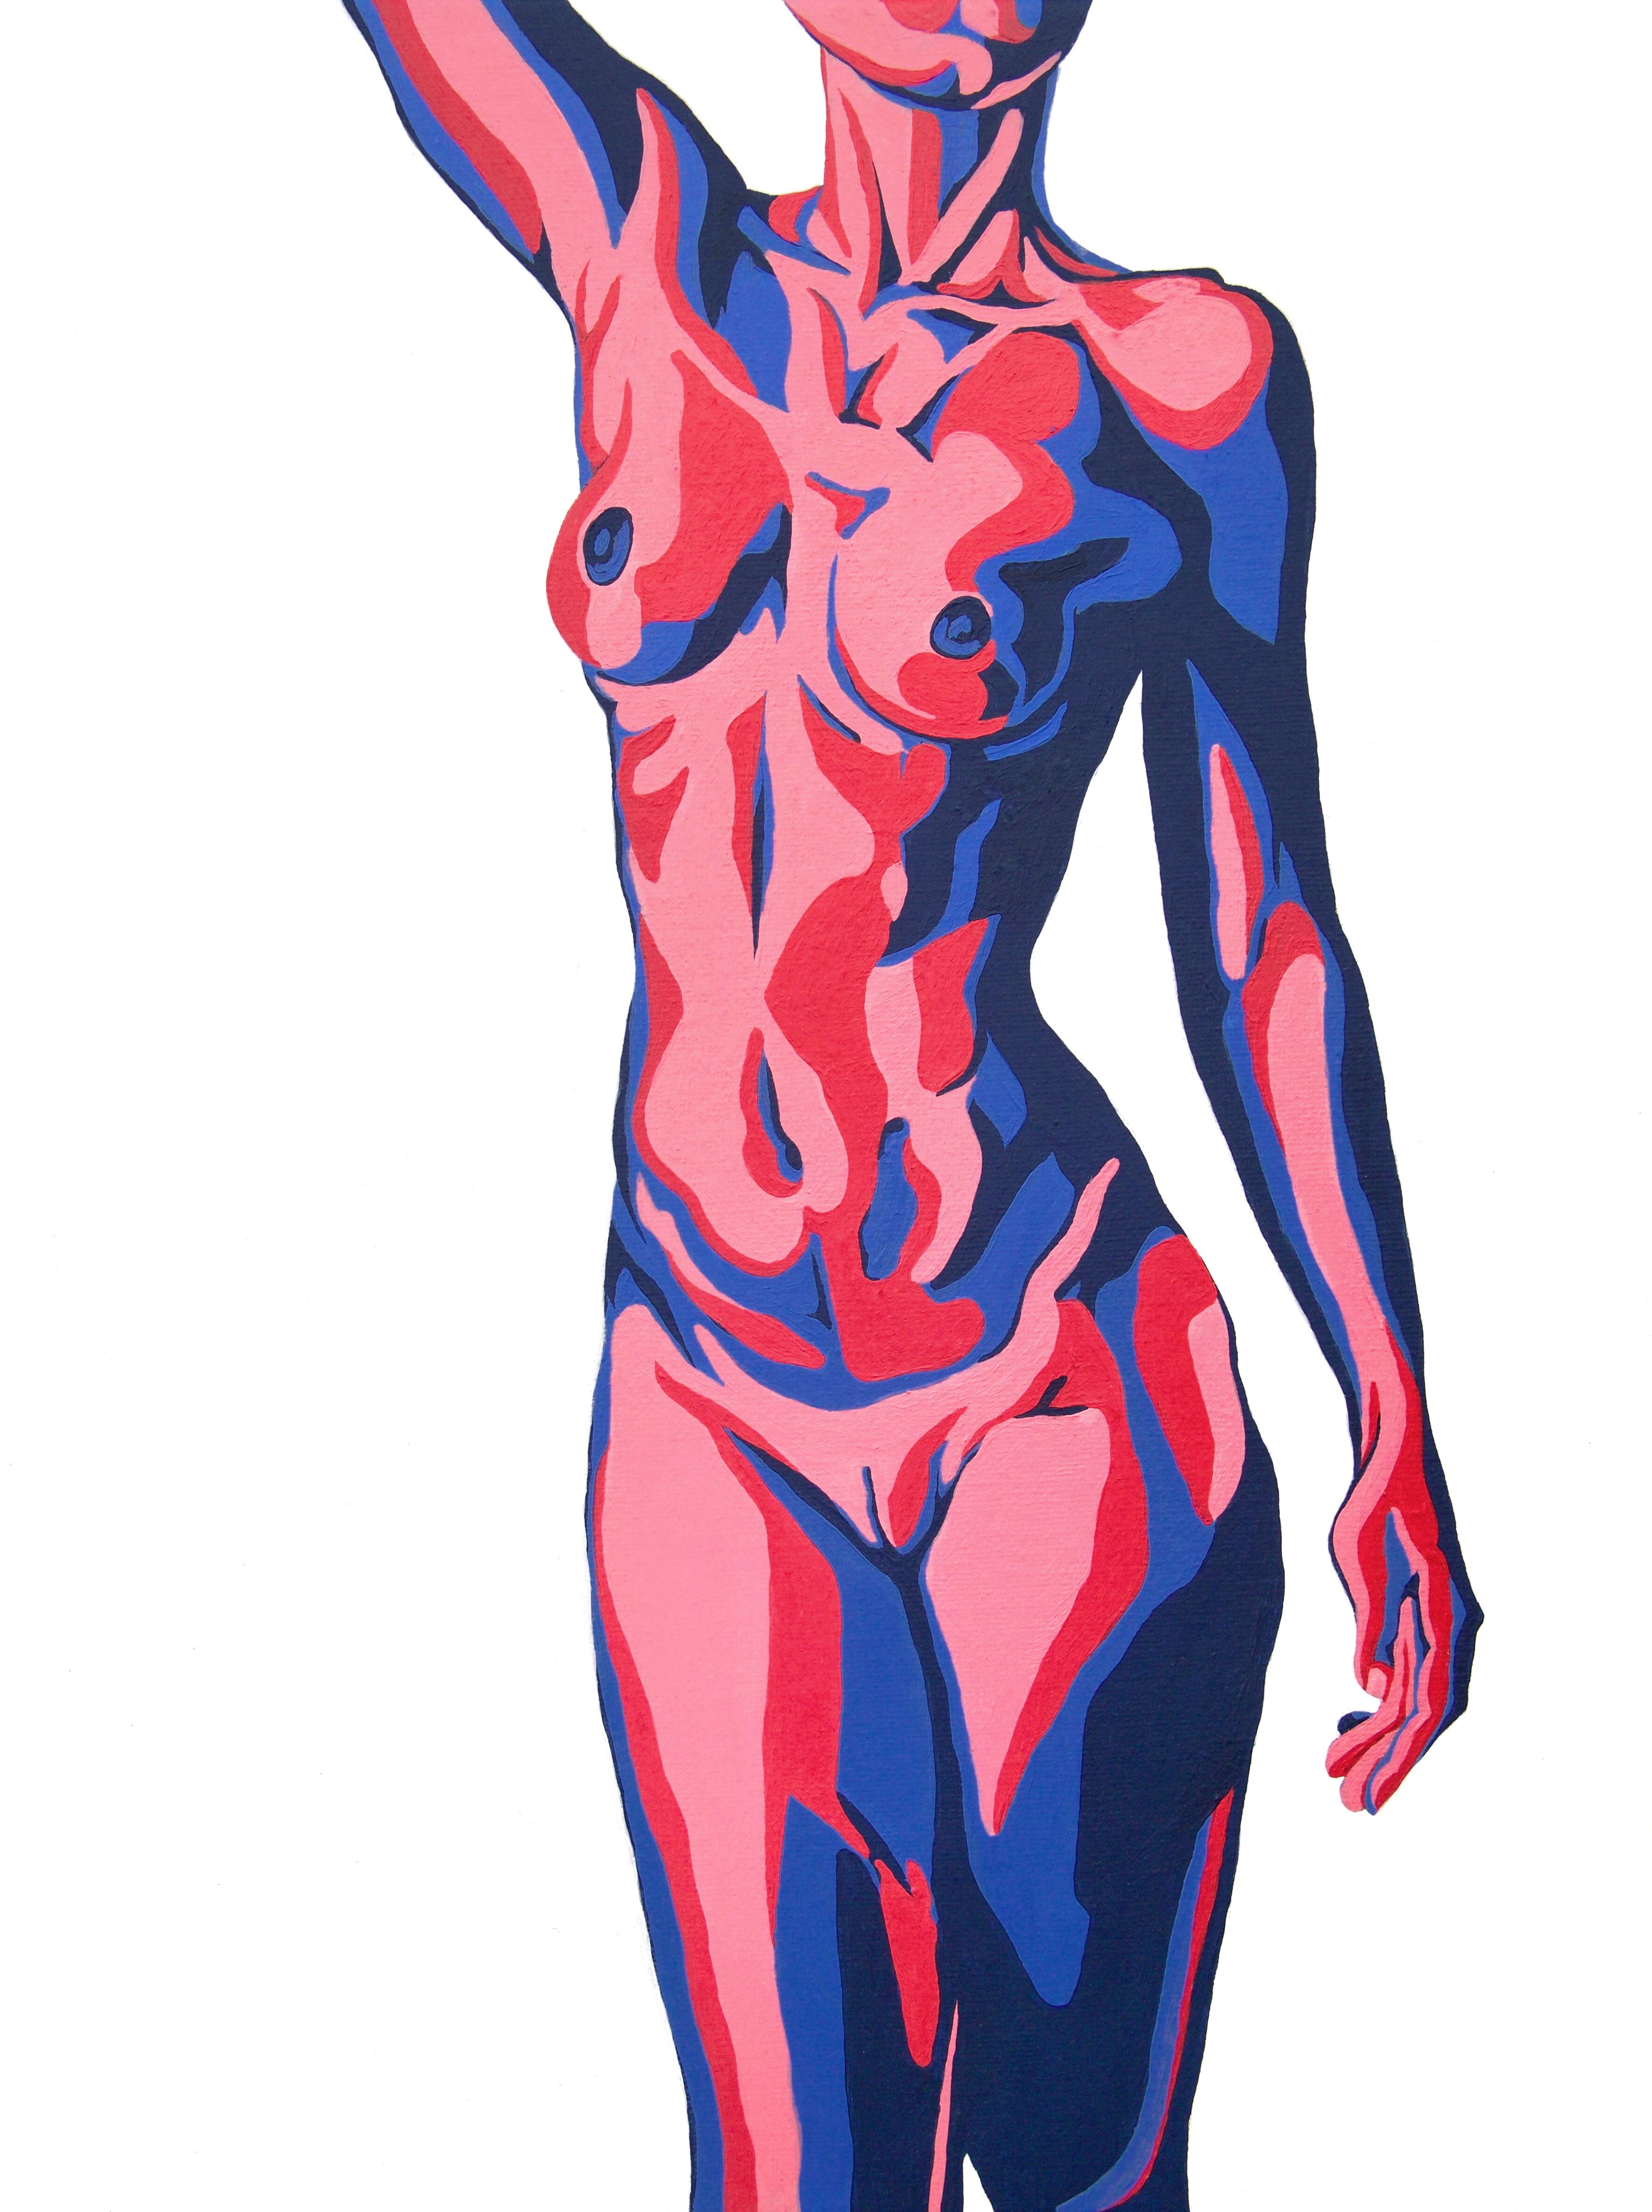 'Female Figure'